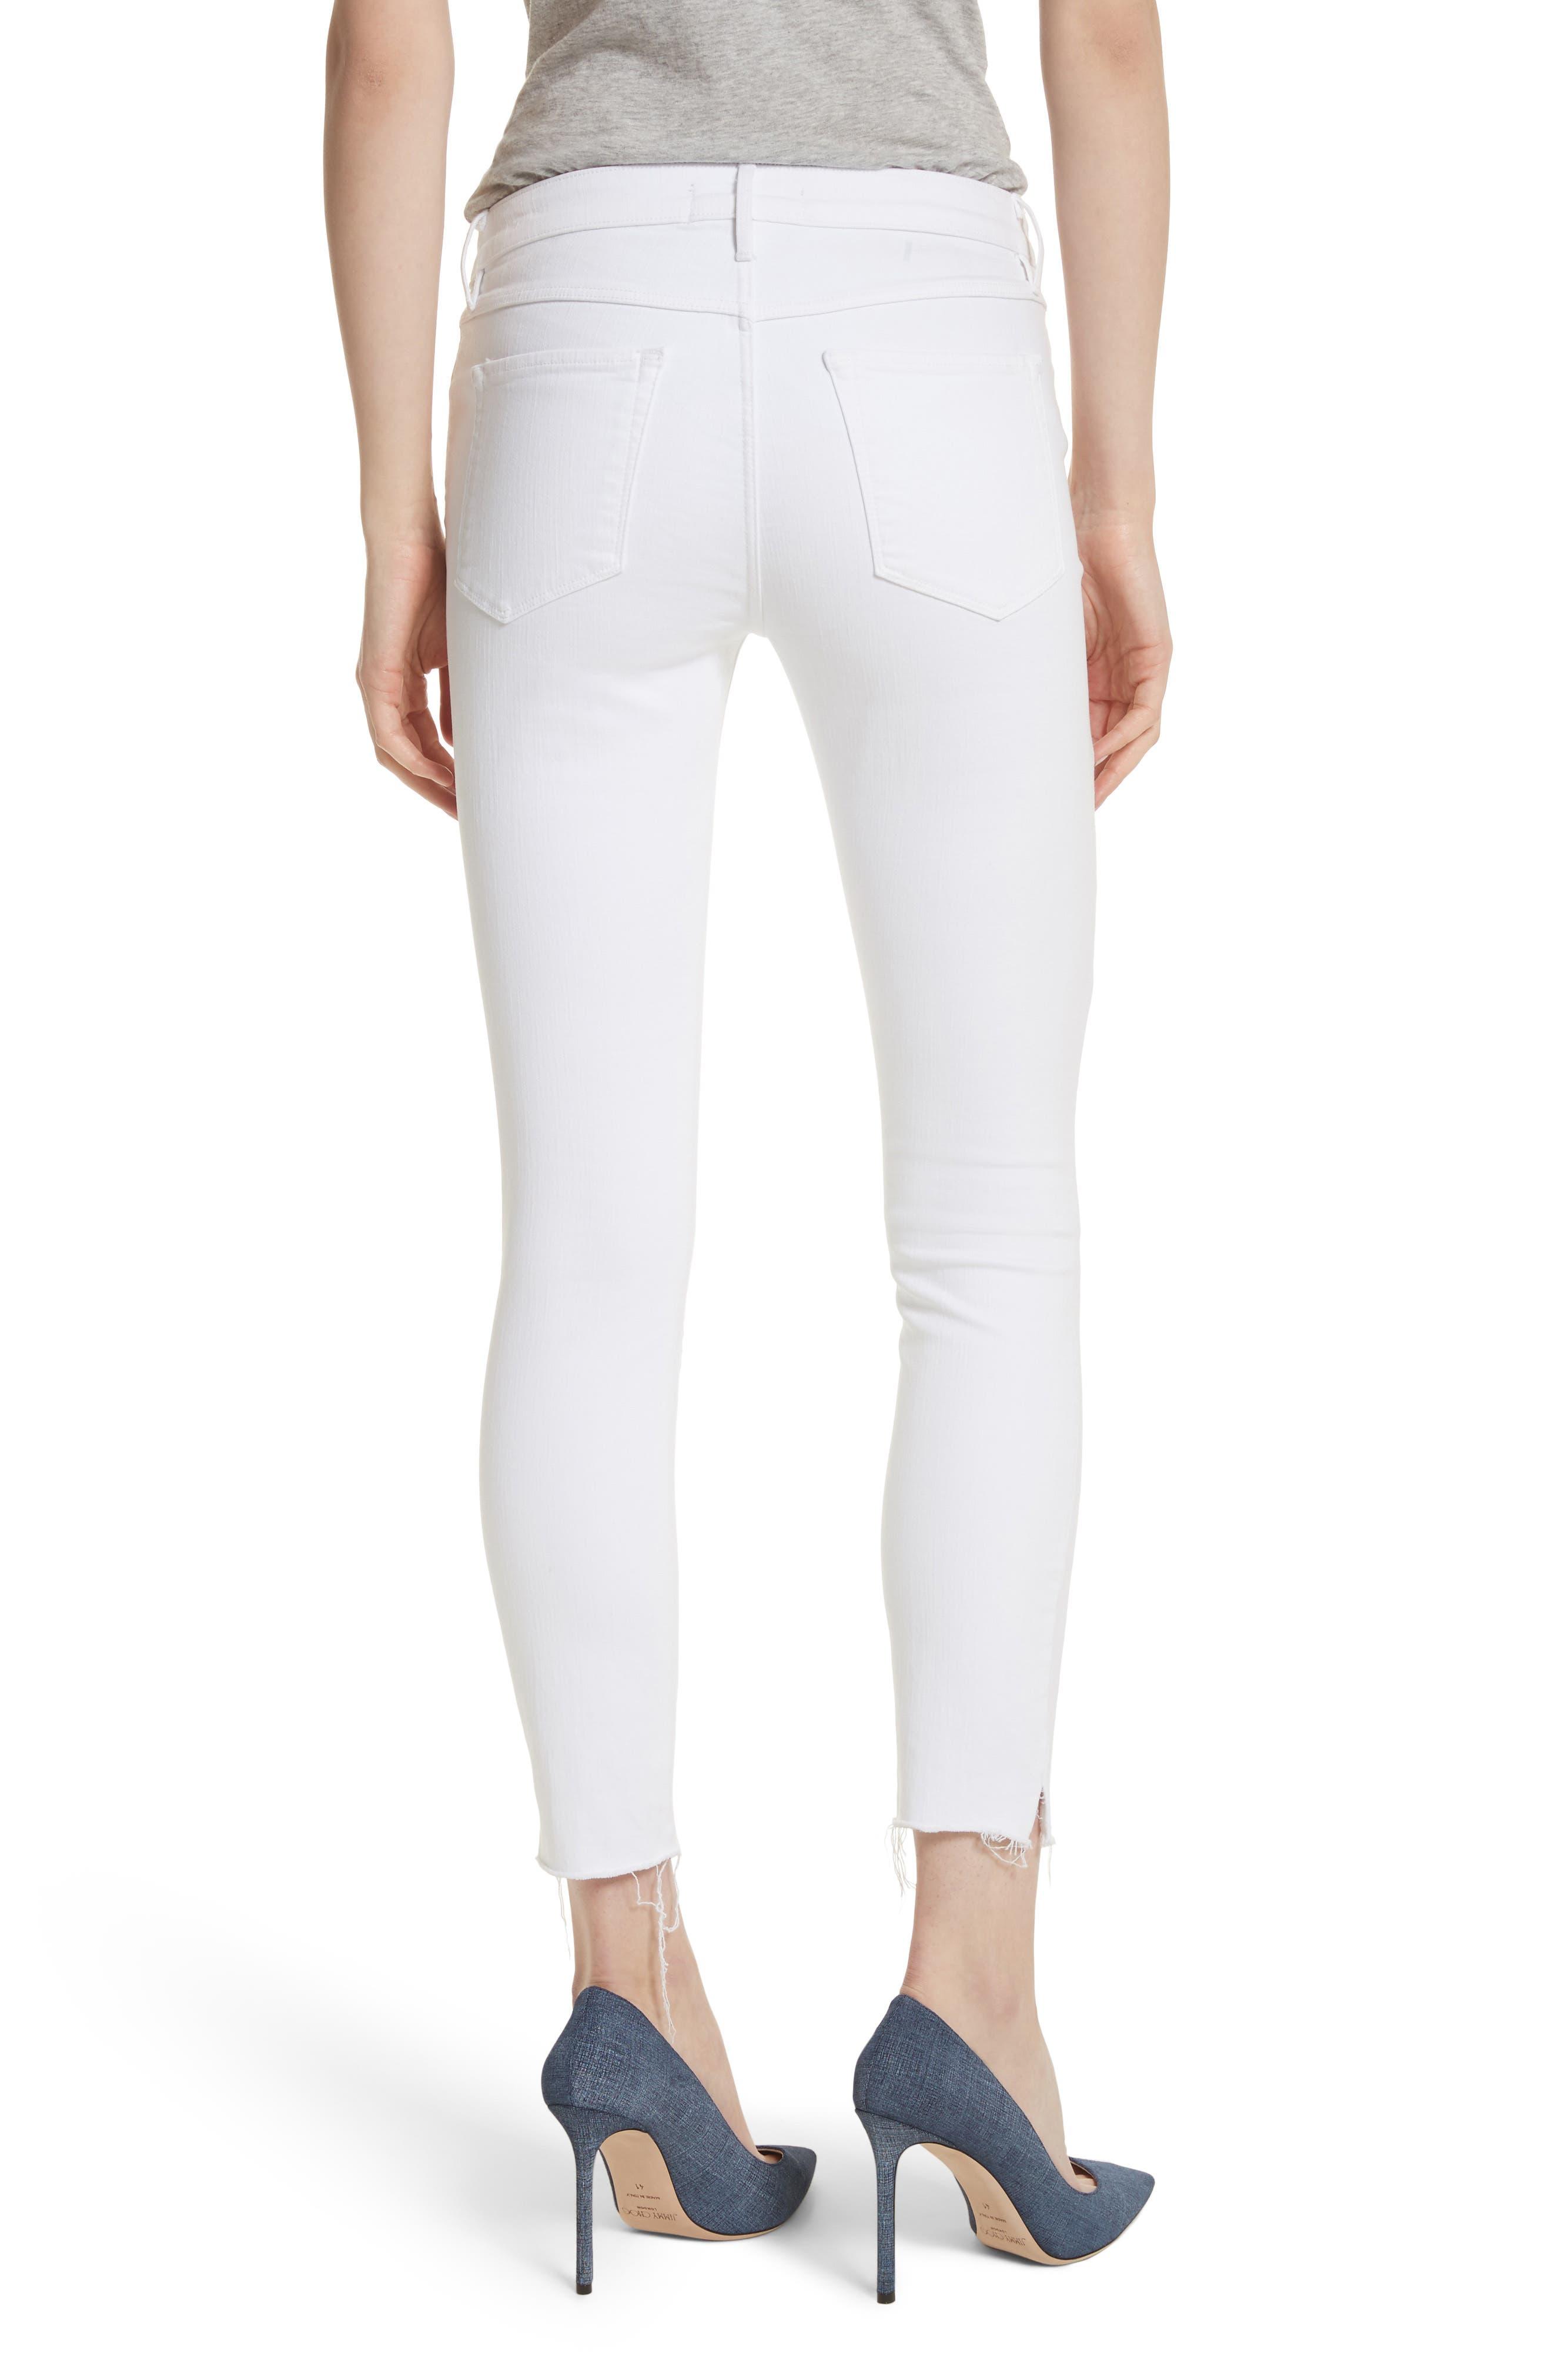 W2 Crop Skinny Jeans,                             Alternate thumbnail 2, color,                             White Tear